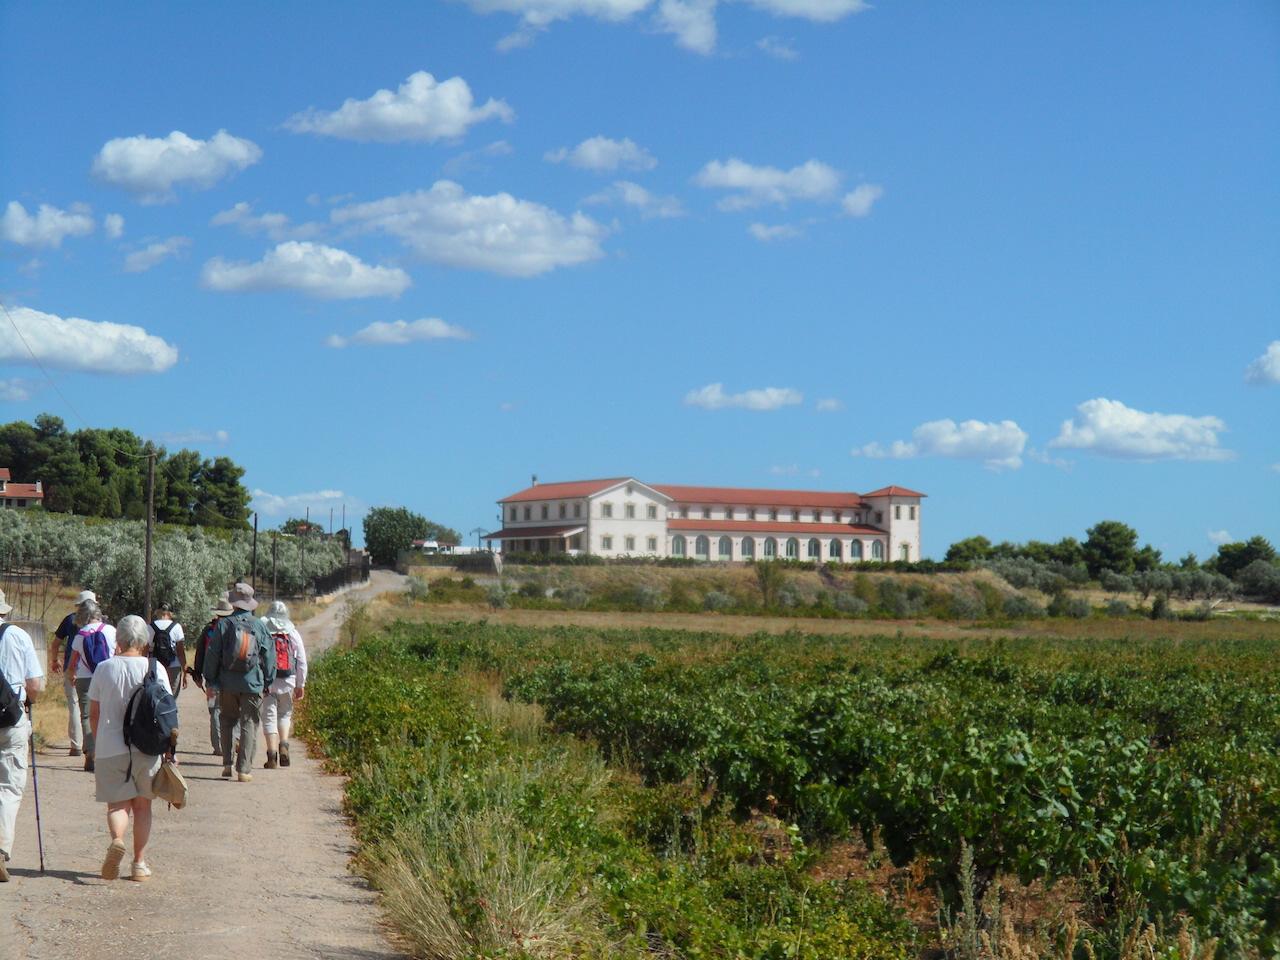 Hiking / Chalkis to Tzivani Winery